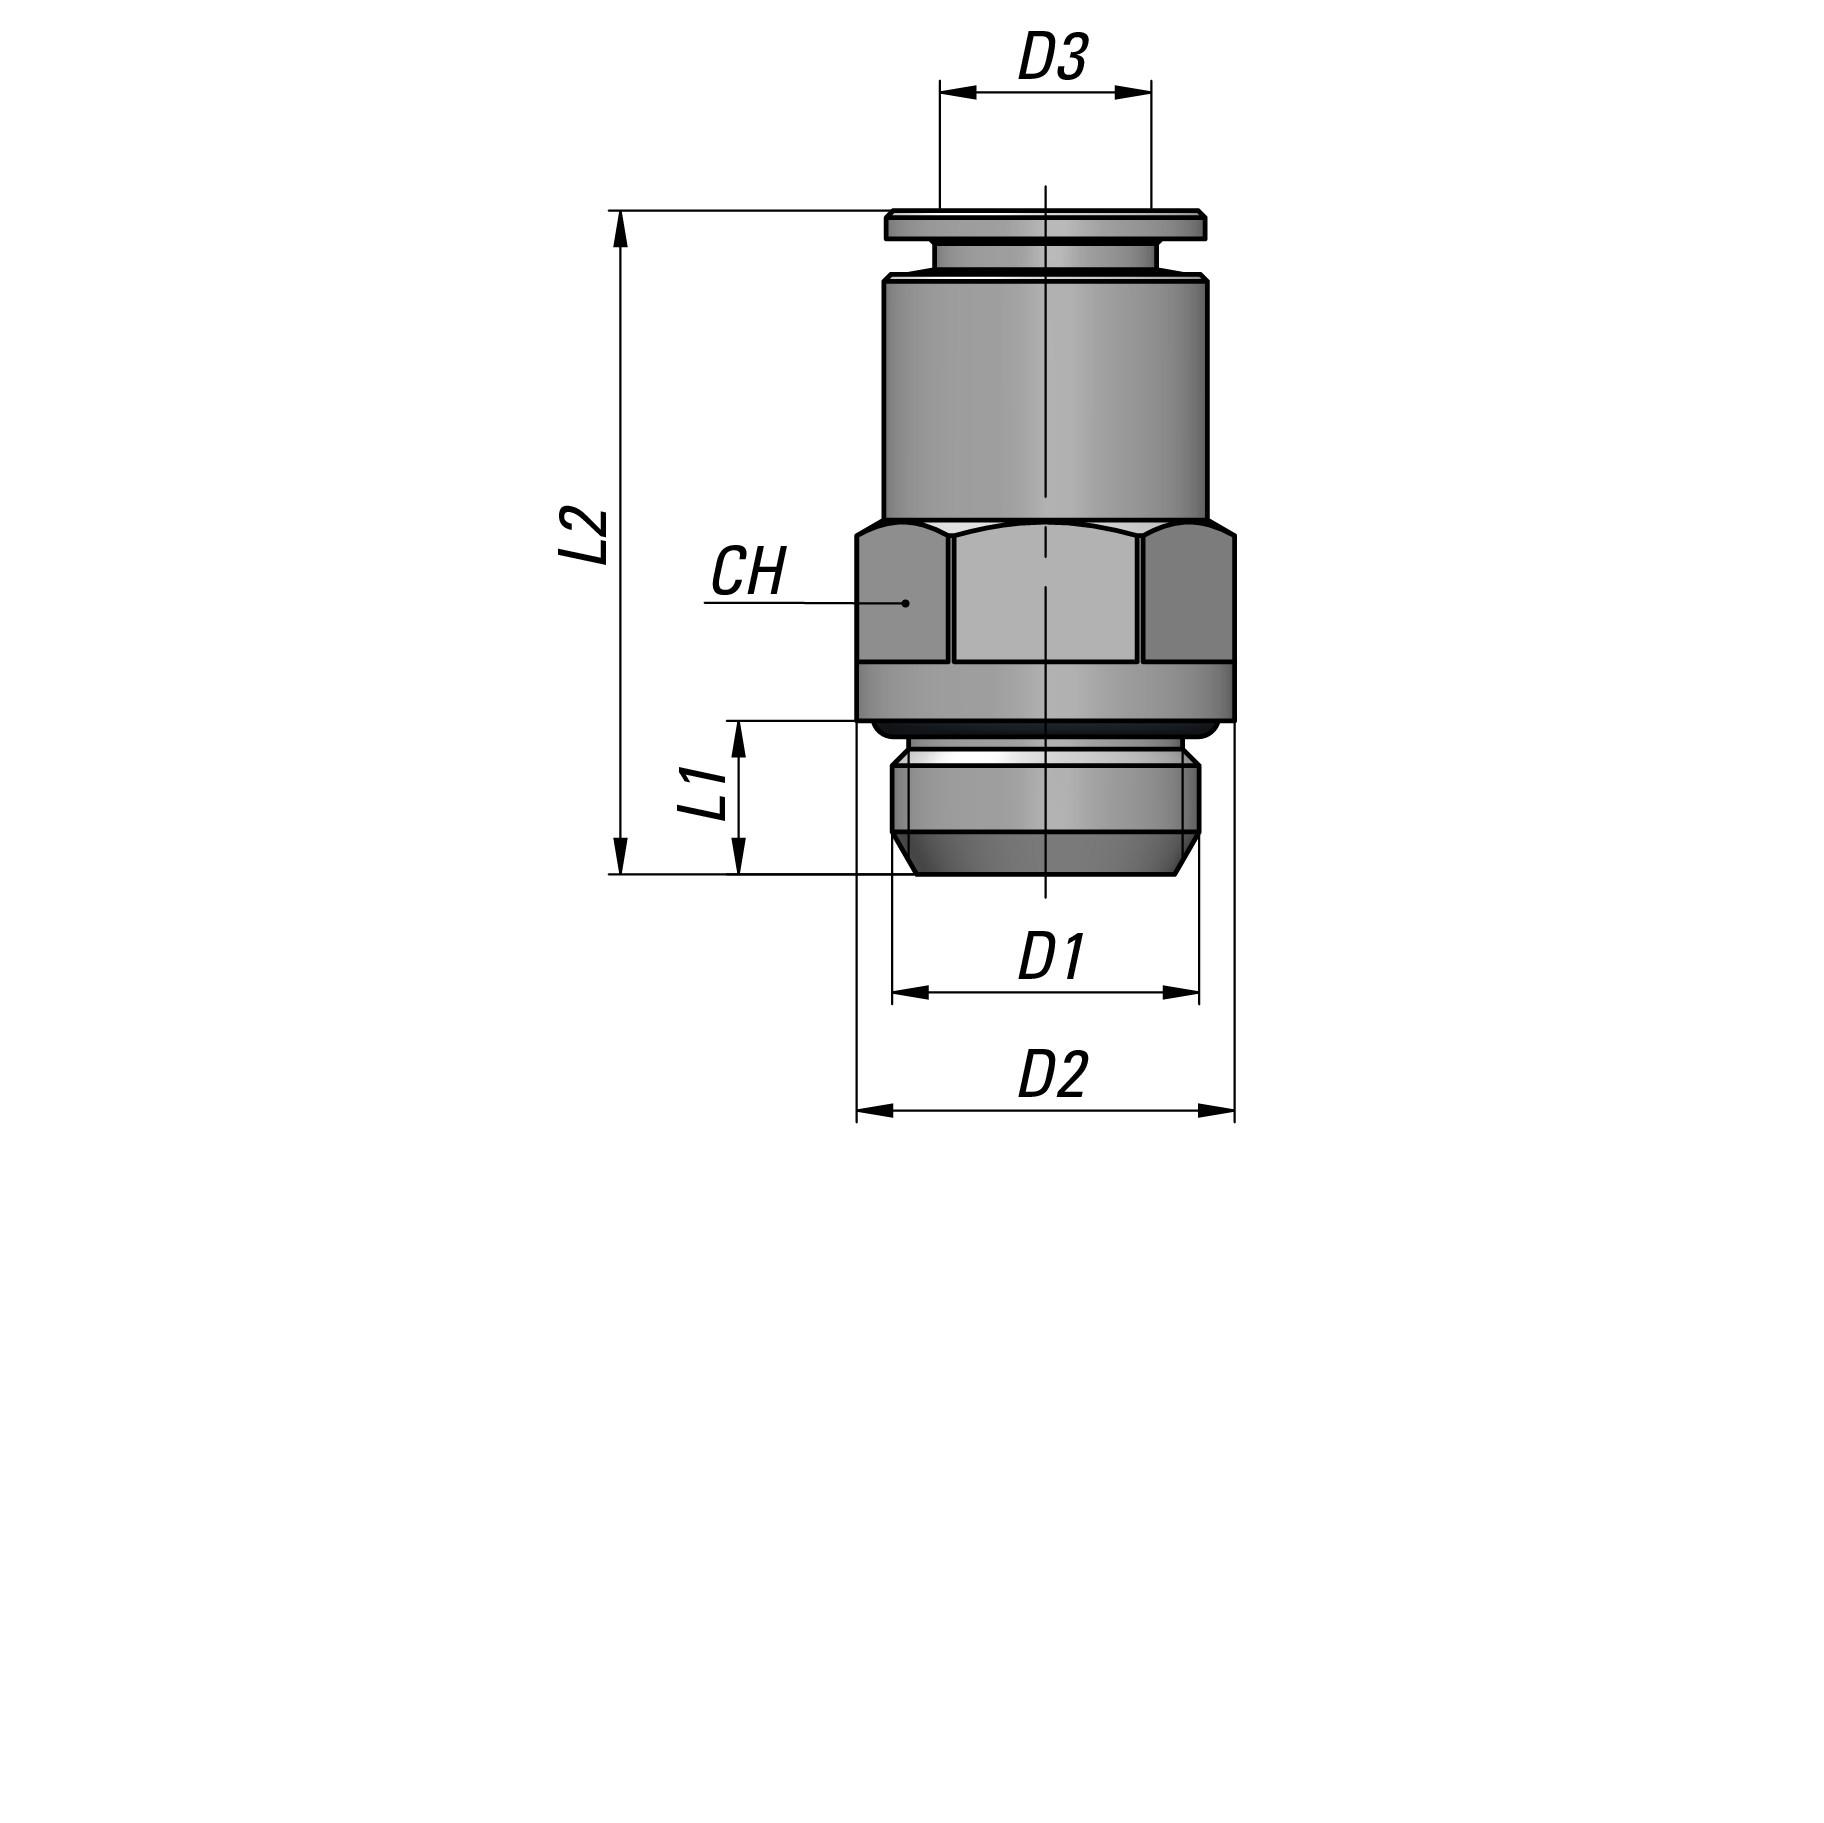 MV55 08 14